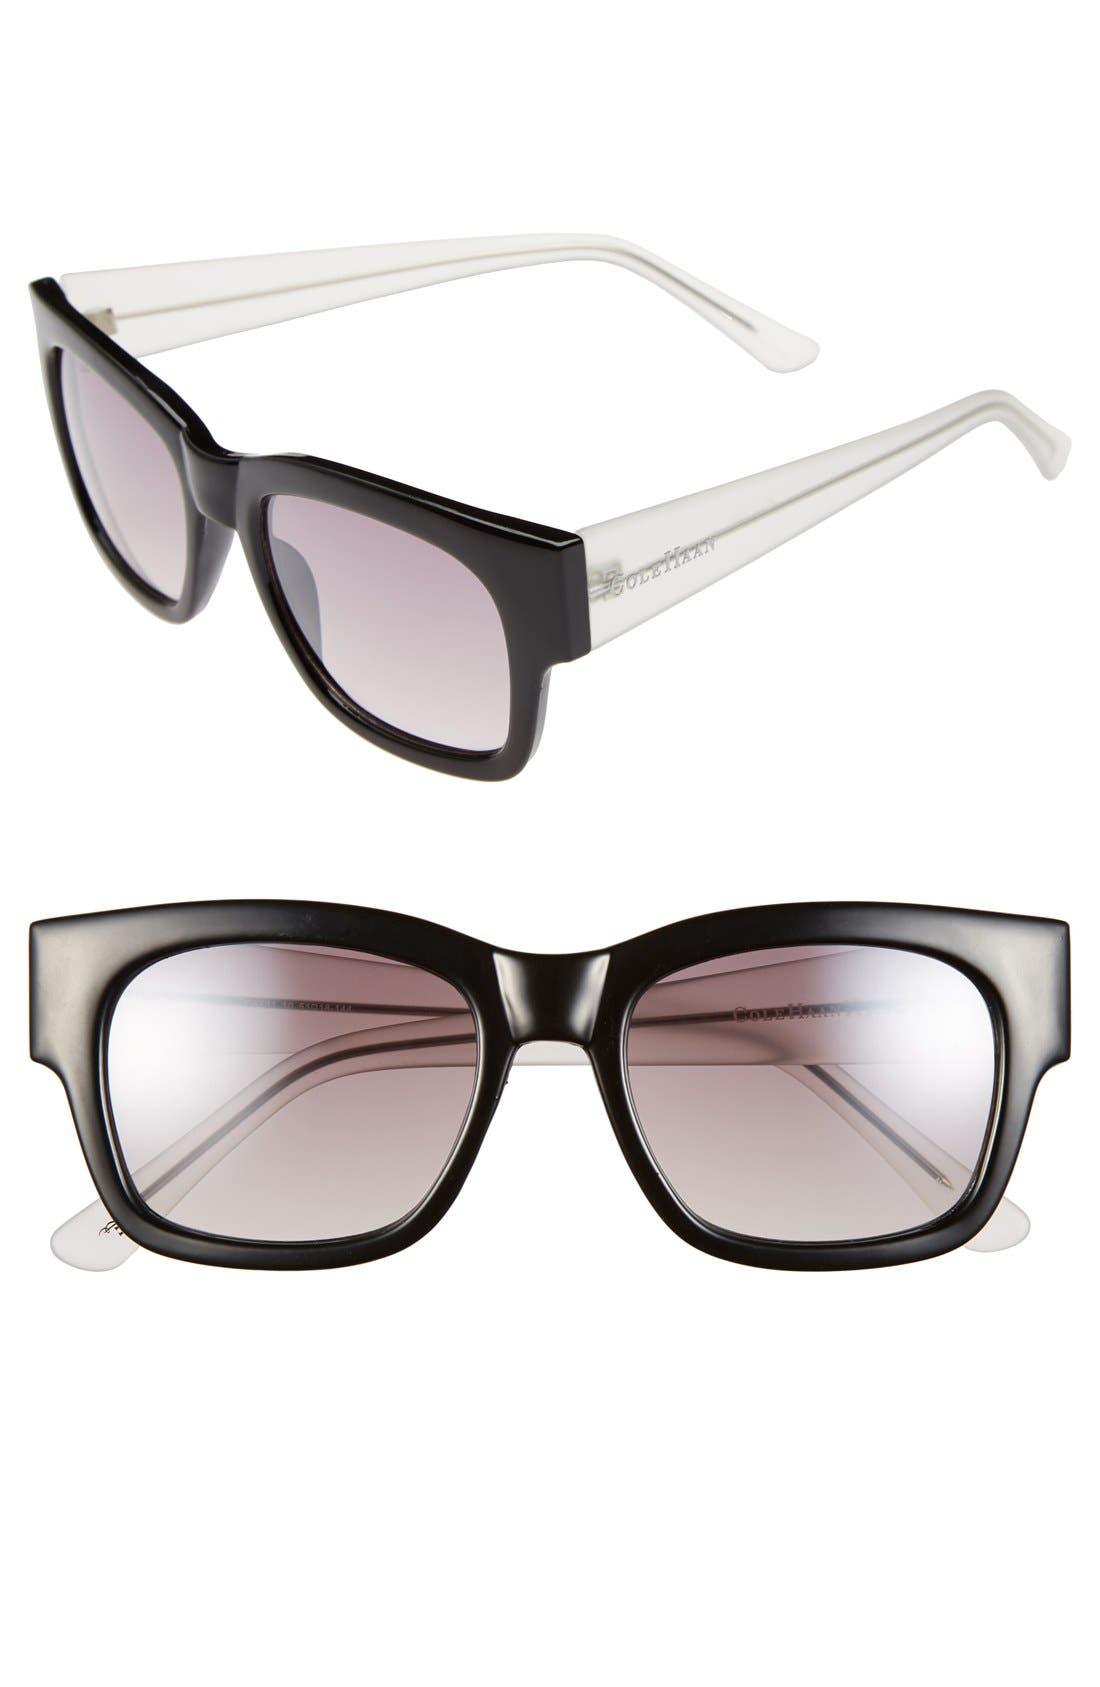 51mm Rectangular Sunglasses,                         Main,                         color, 001